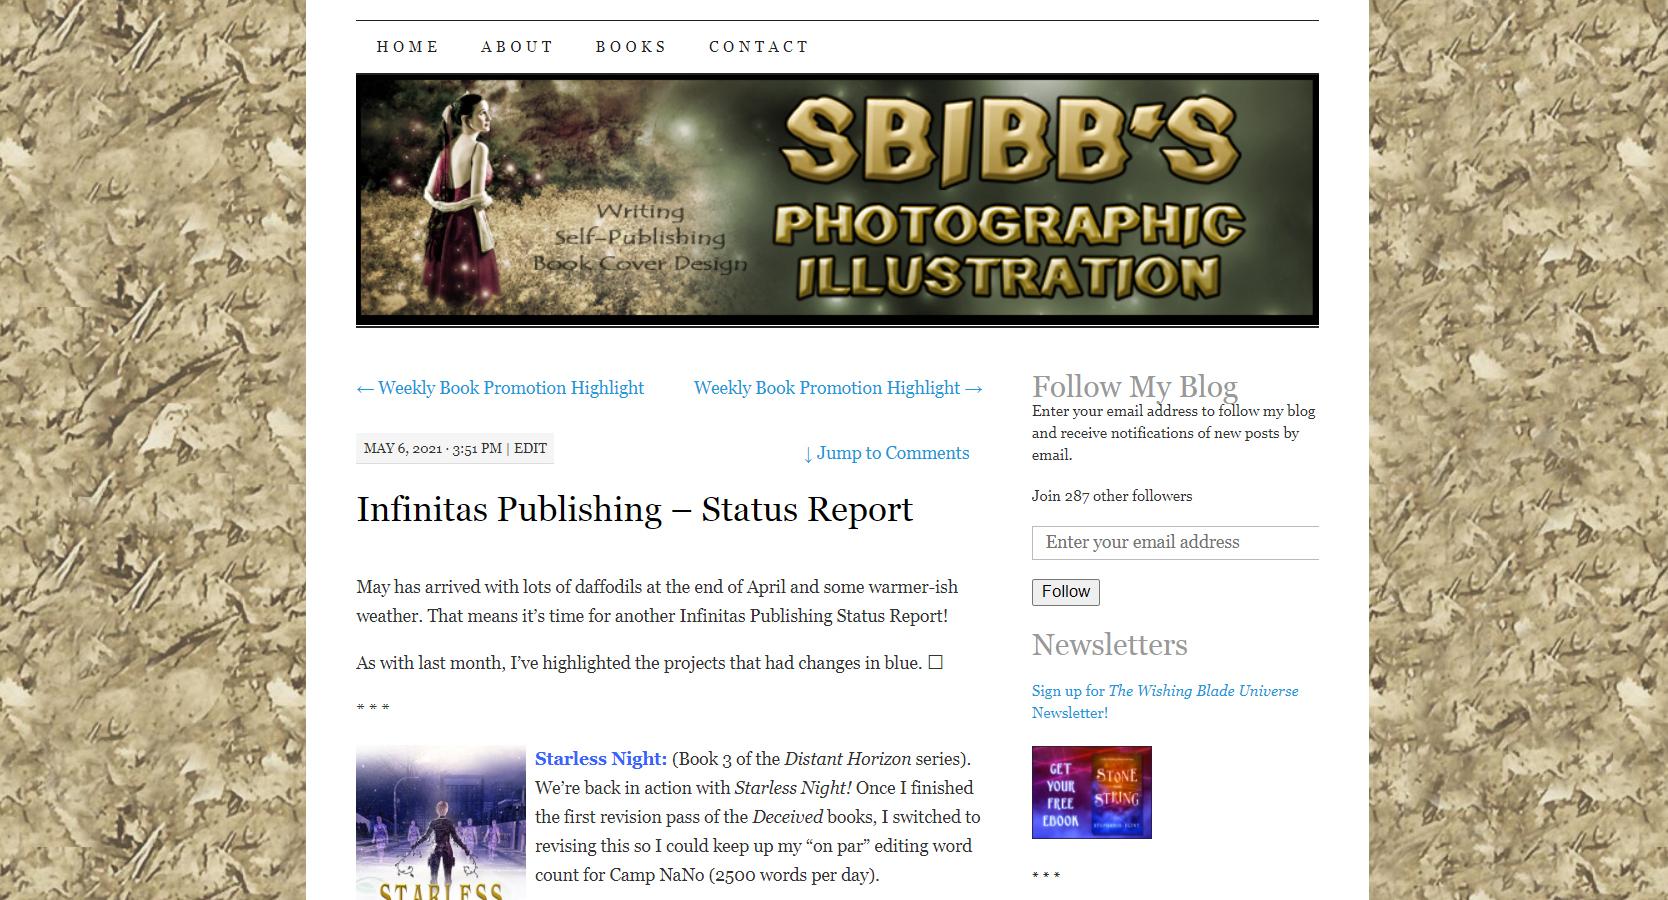 SBibb's Photographic Illustration Original Page Design